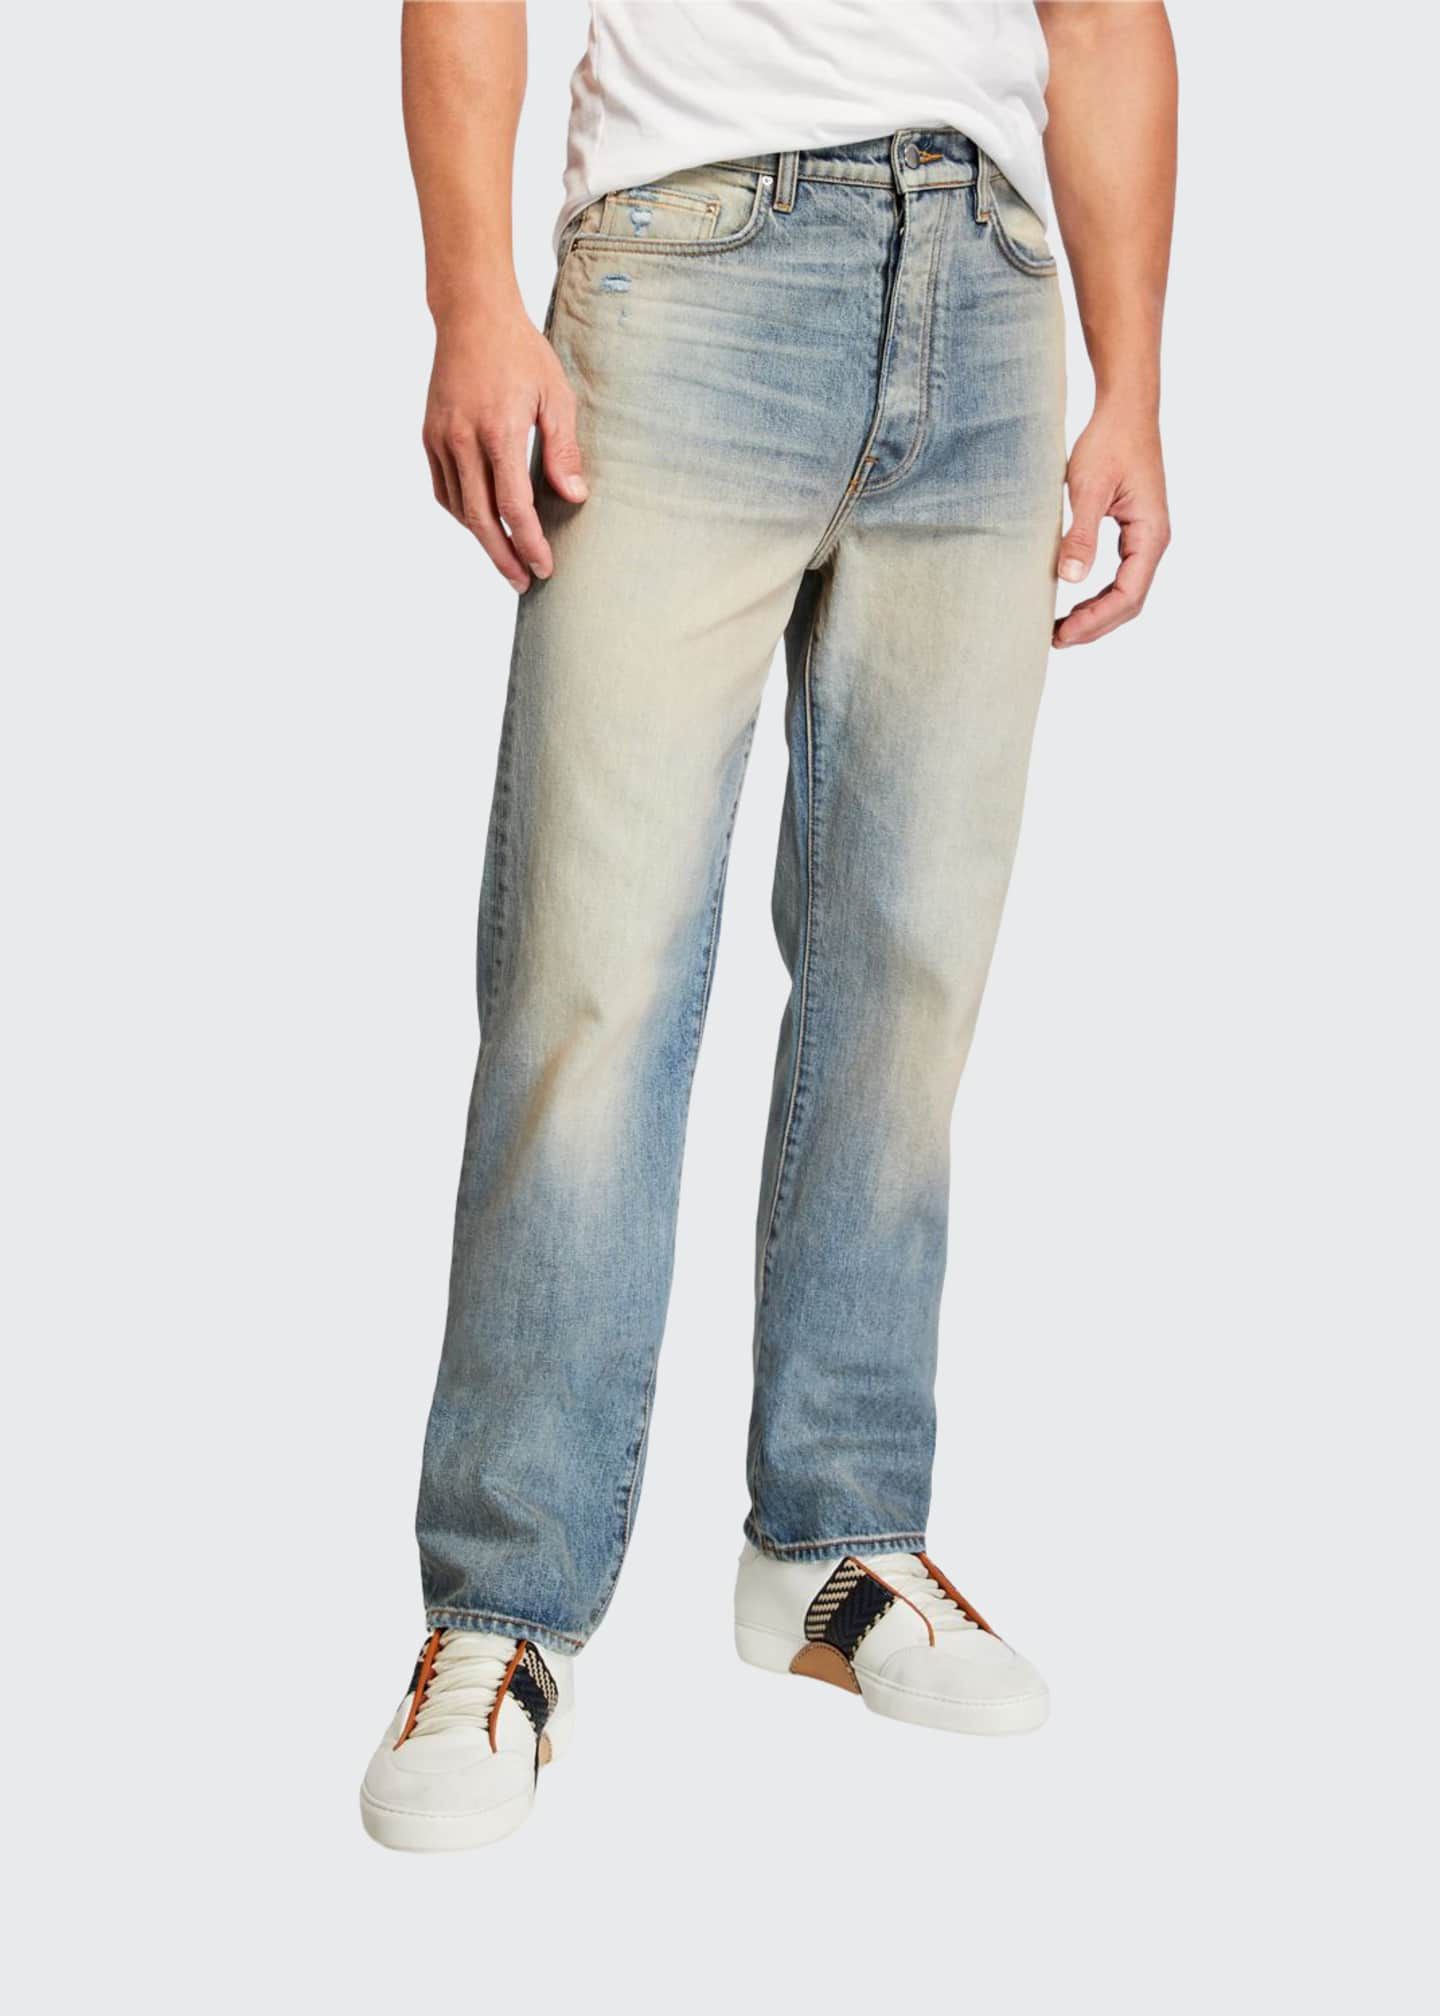 Amiri Men's Relaxed Vintage Light-Wash Jeans